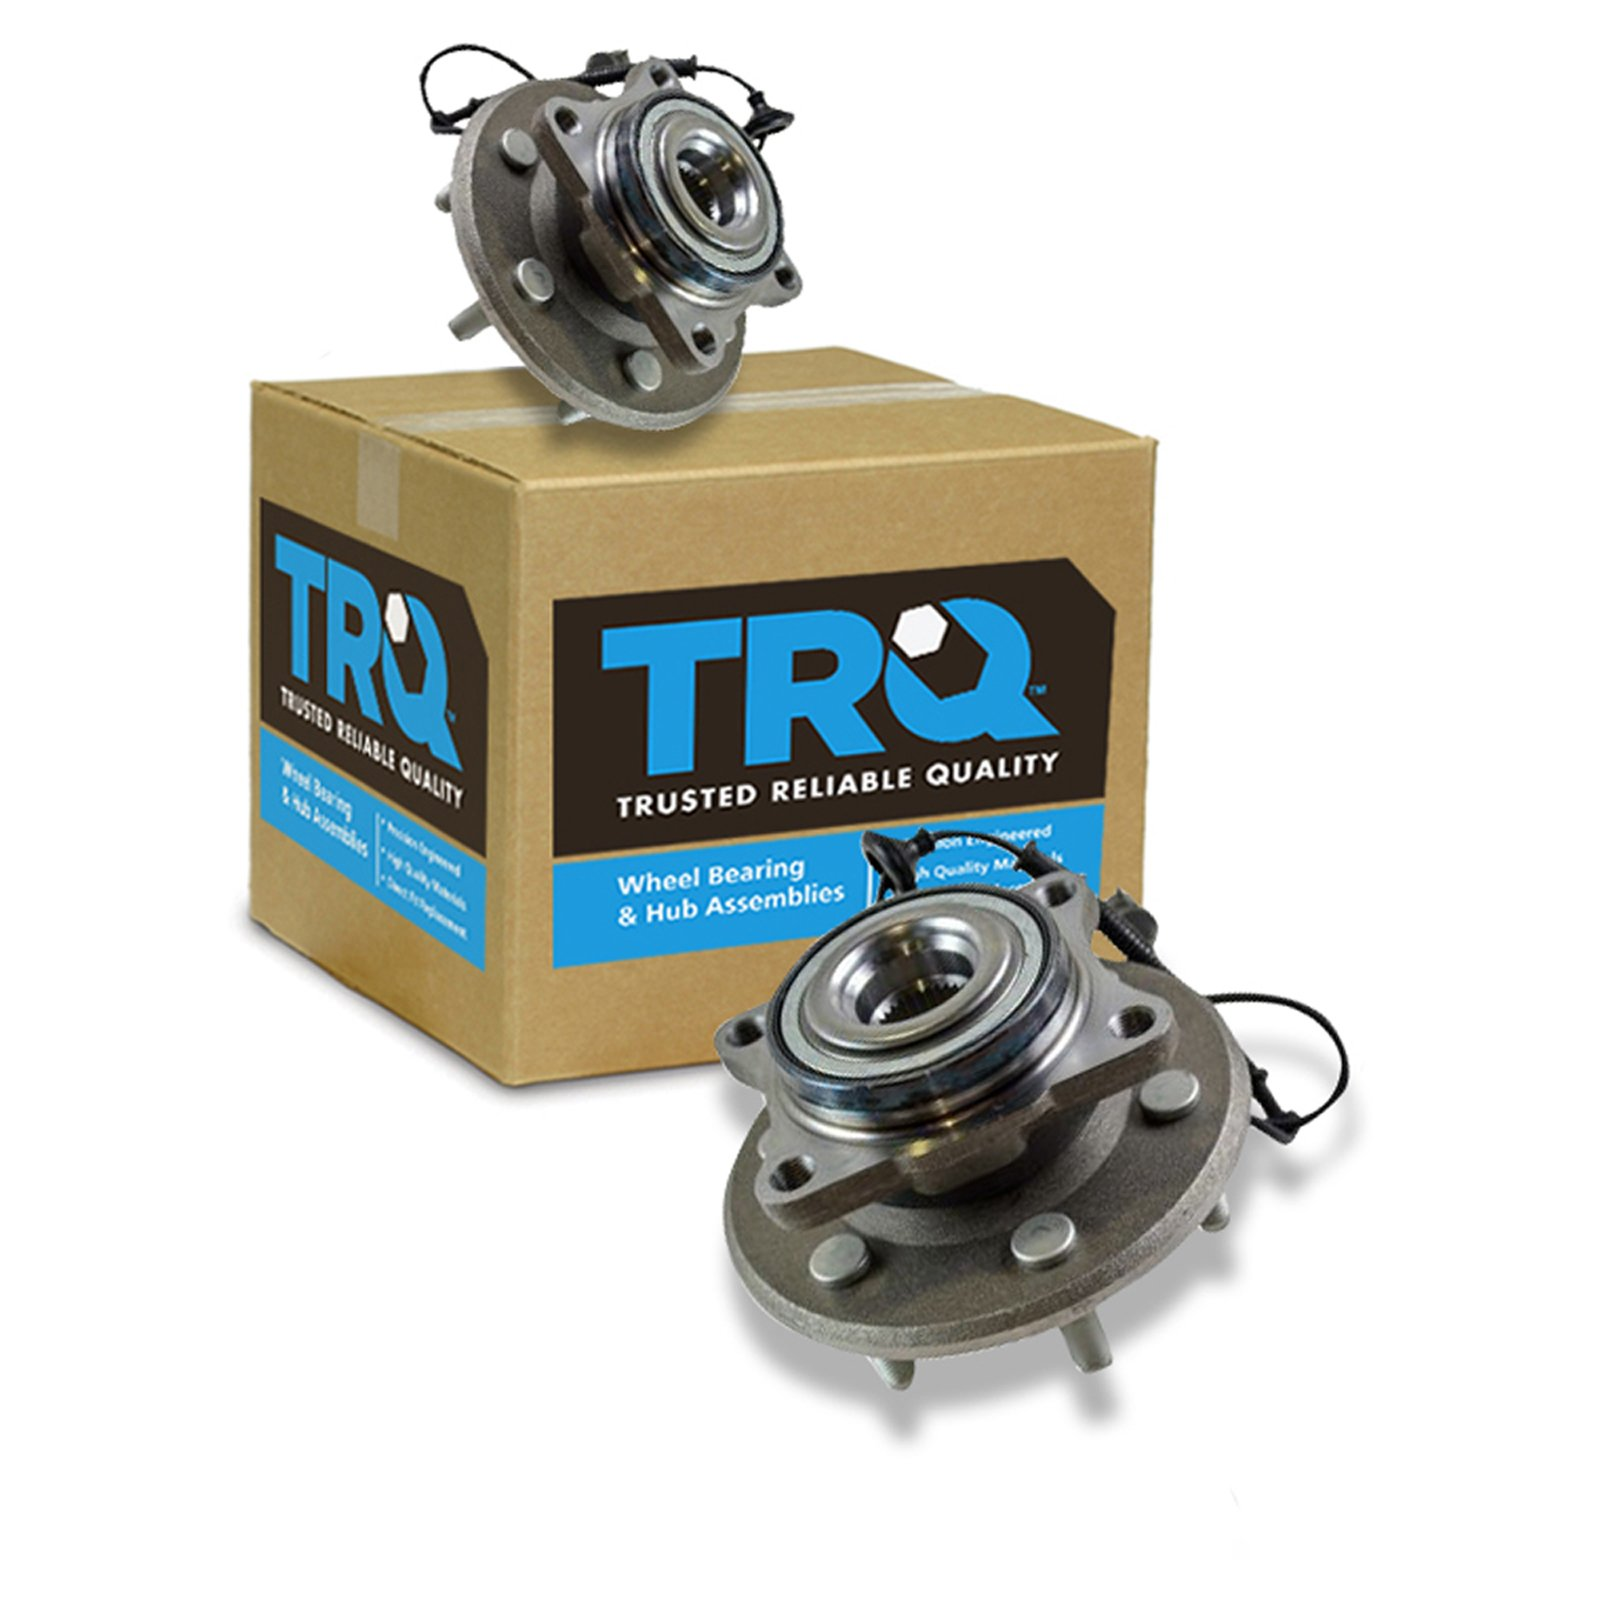 TRQ Rear Wheel Hubs & Bearings Pair Set of 2 for 03-06 Expedition Navigator